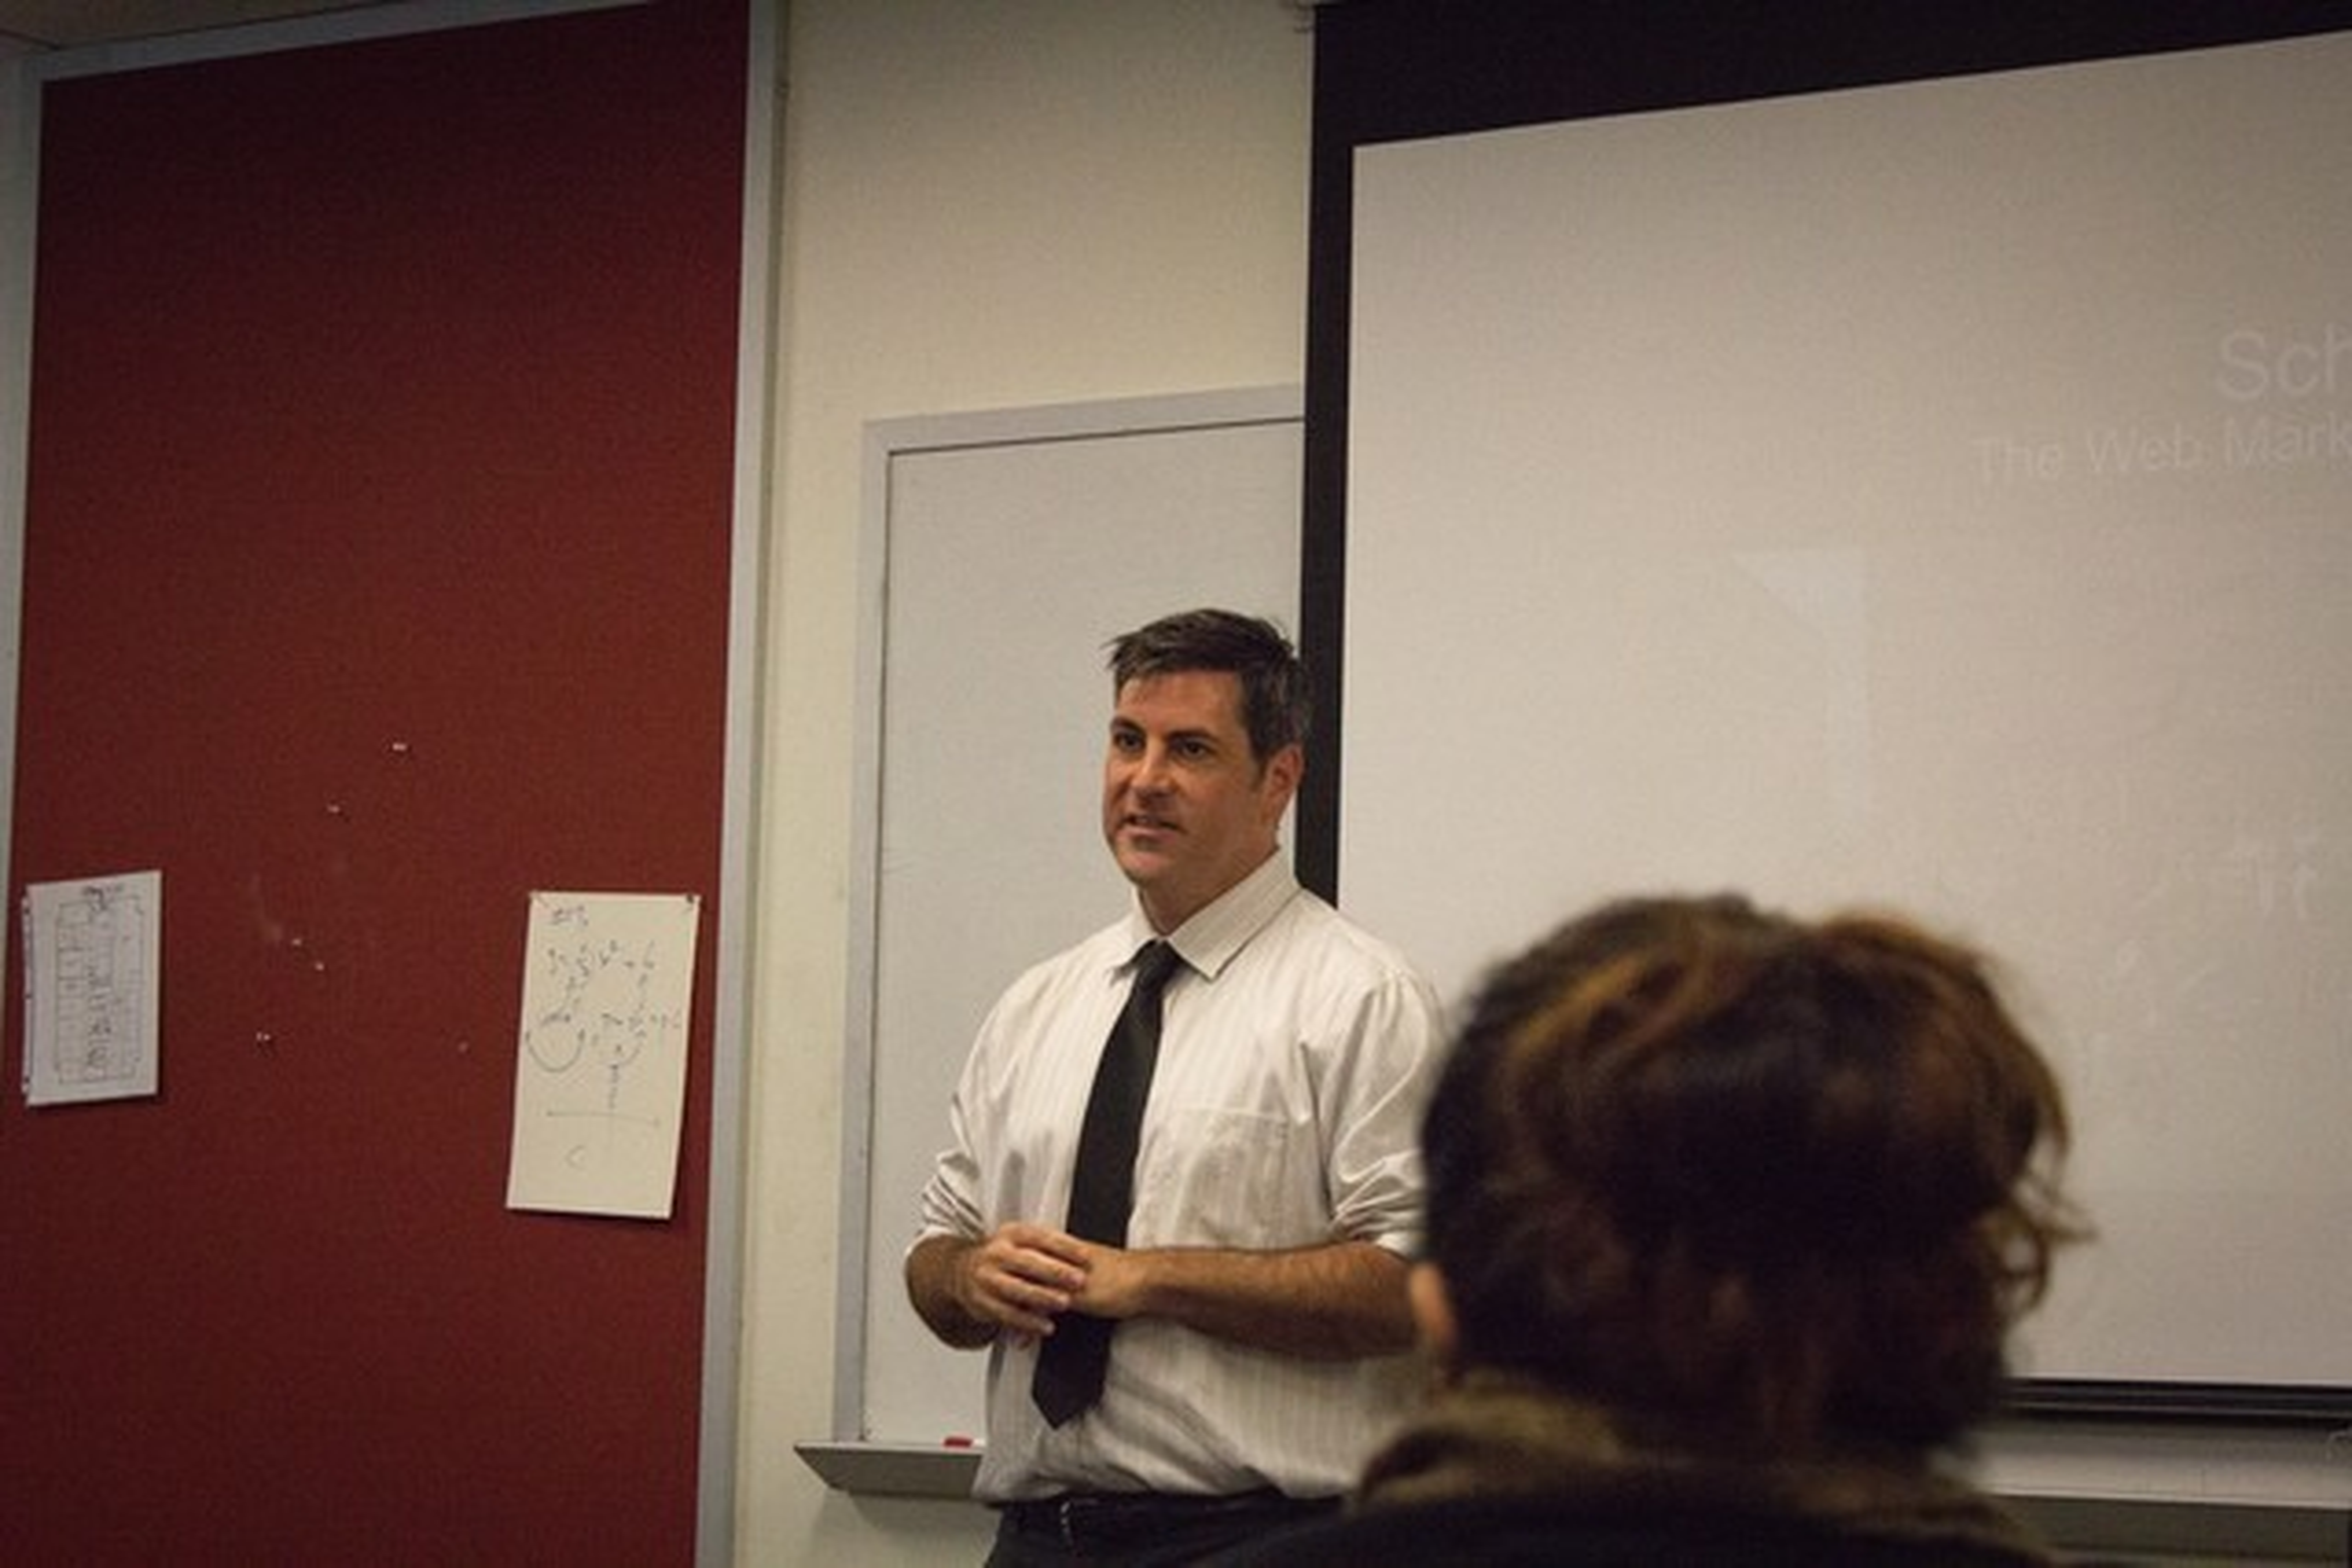 Houston Website Designers Schipul Public Speaking 2012-9